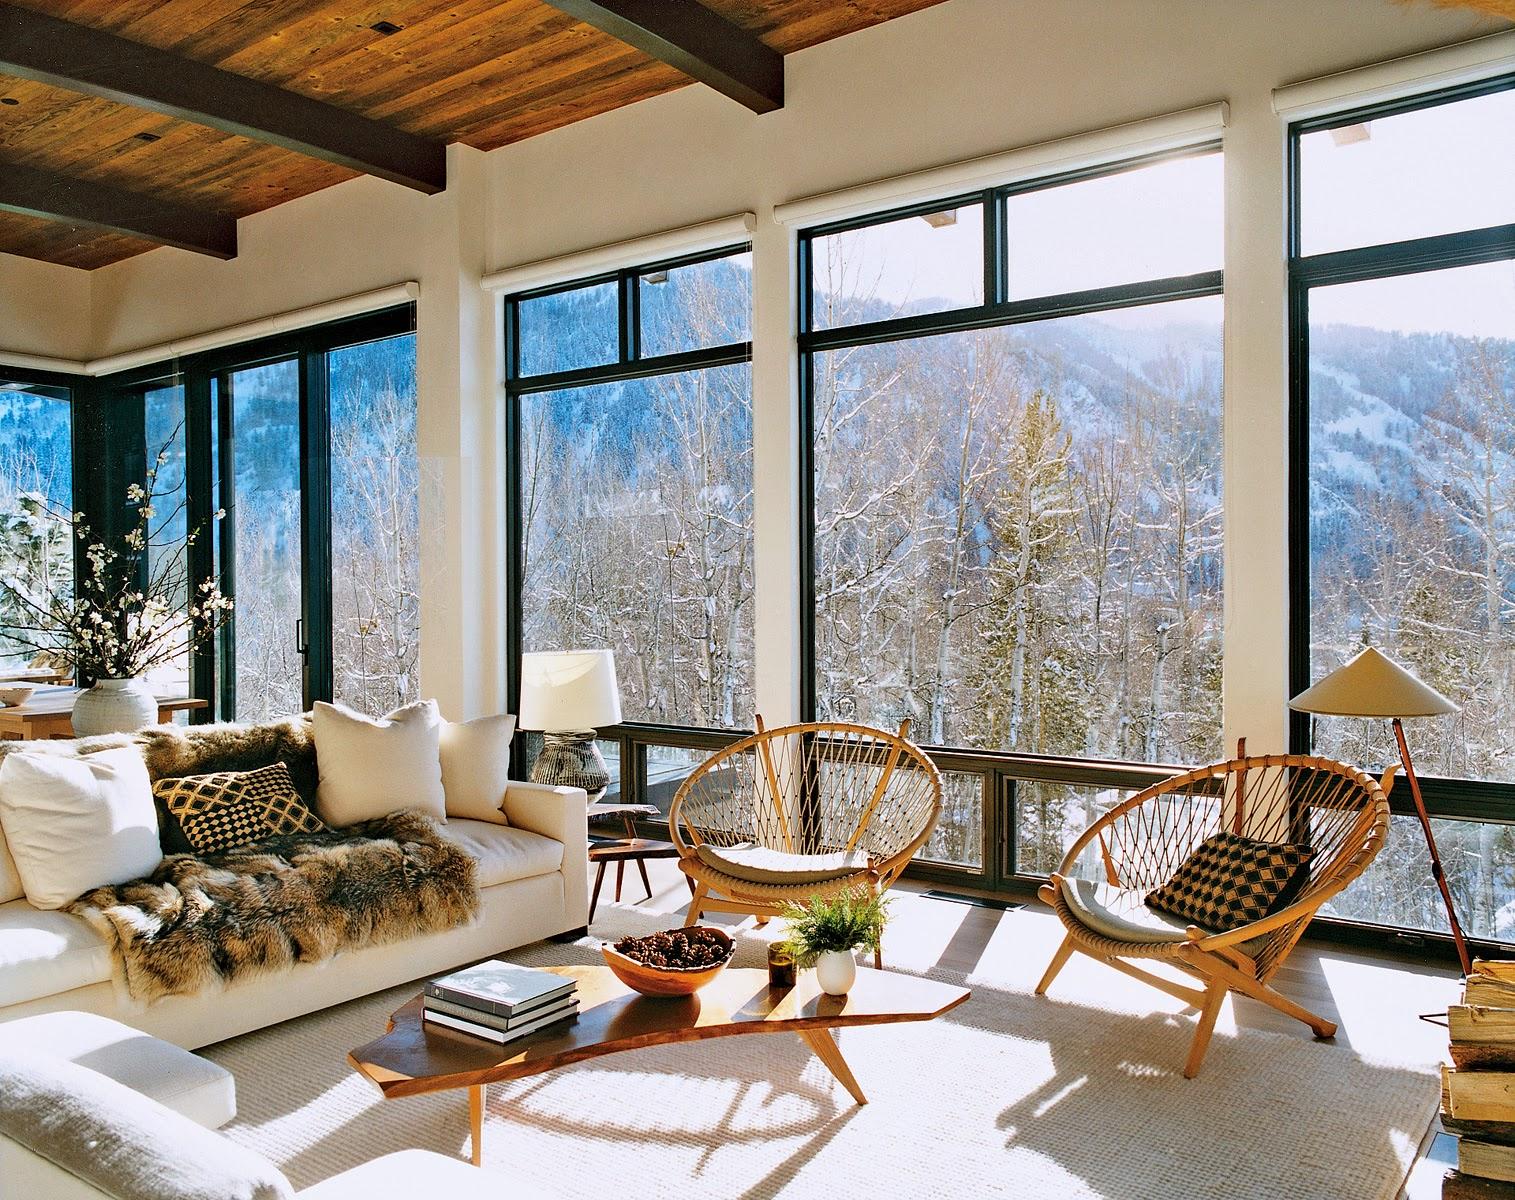 Aerin Lauders modern winter home in Aspen stunning mountain views 1515x1200